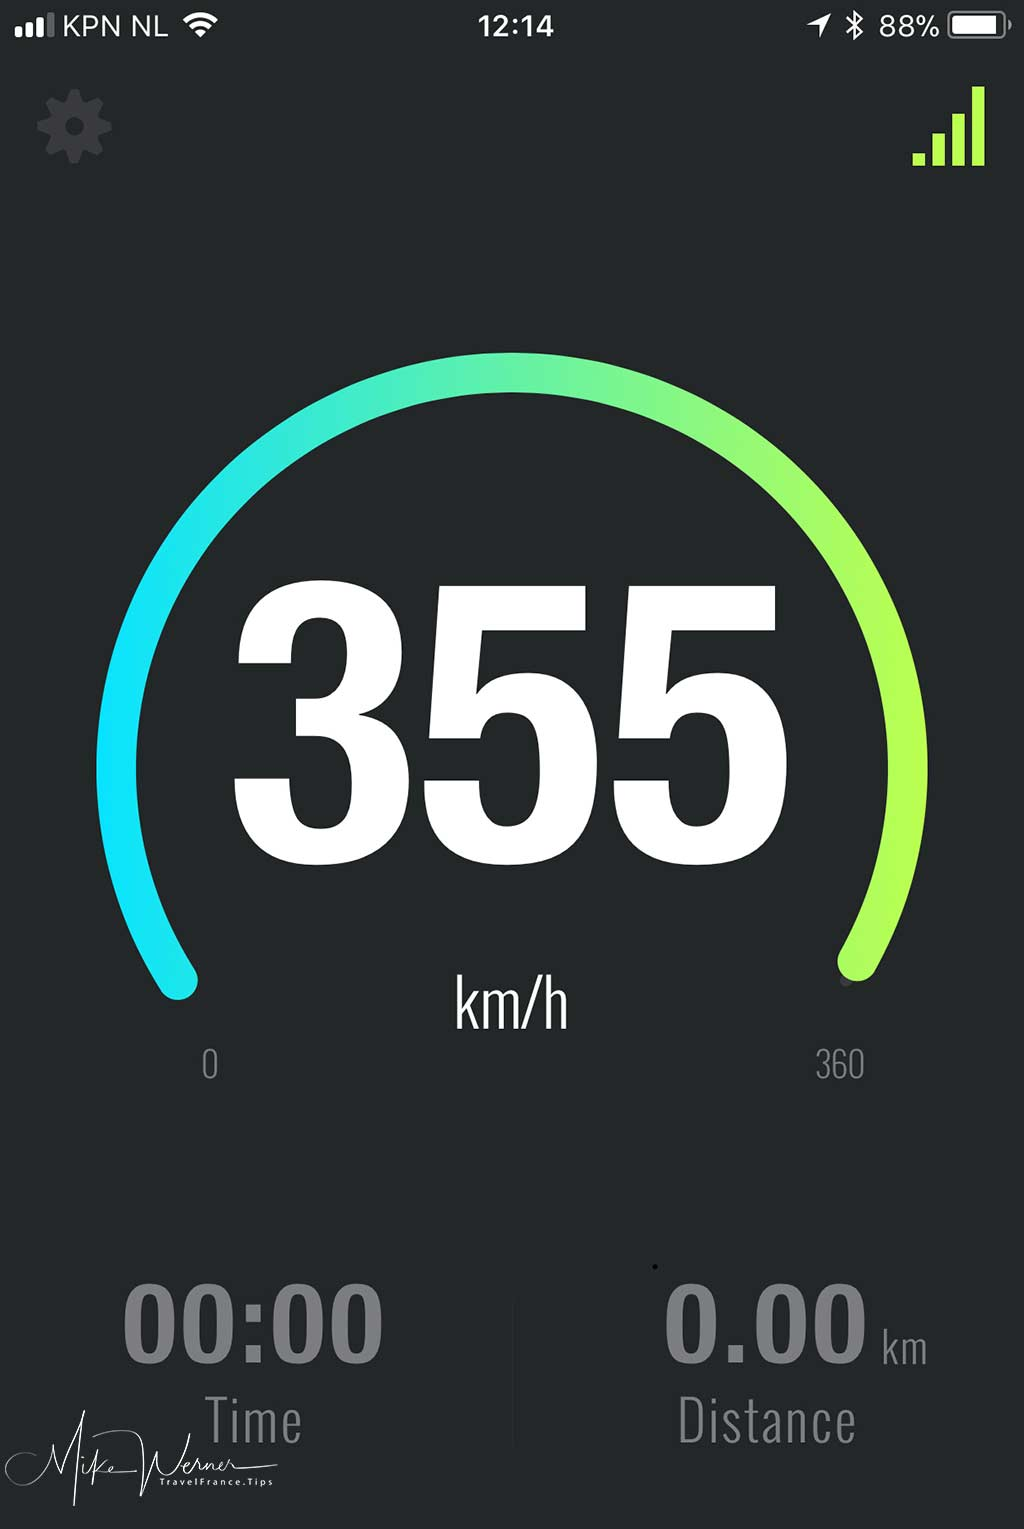 GPS speed captured on a recent trip Paris-Amsterdam